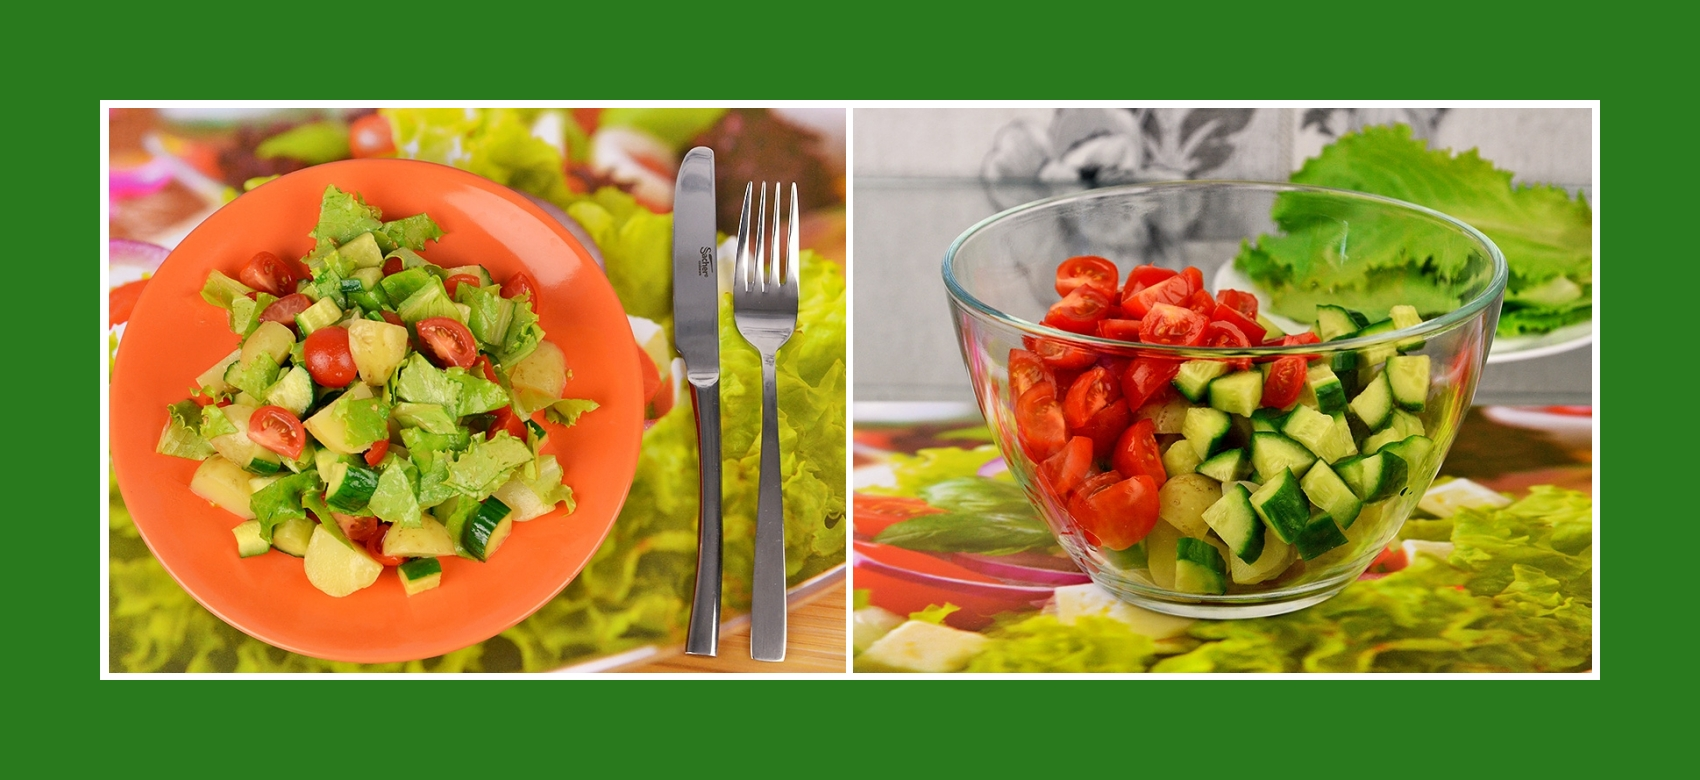 Salat aus Frühkartoffeln, Tomaten und Gurken